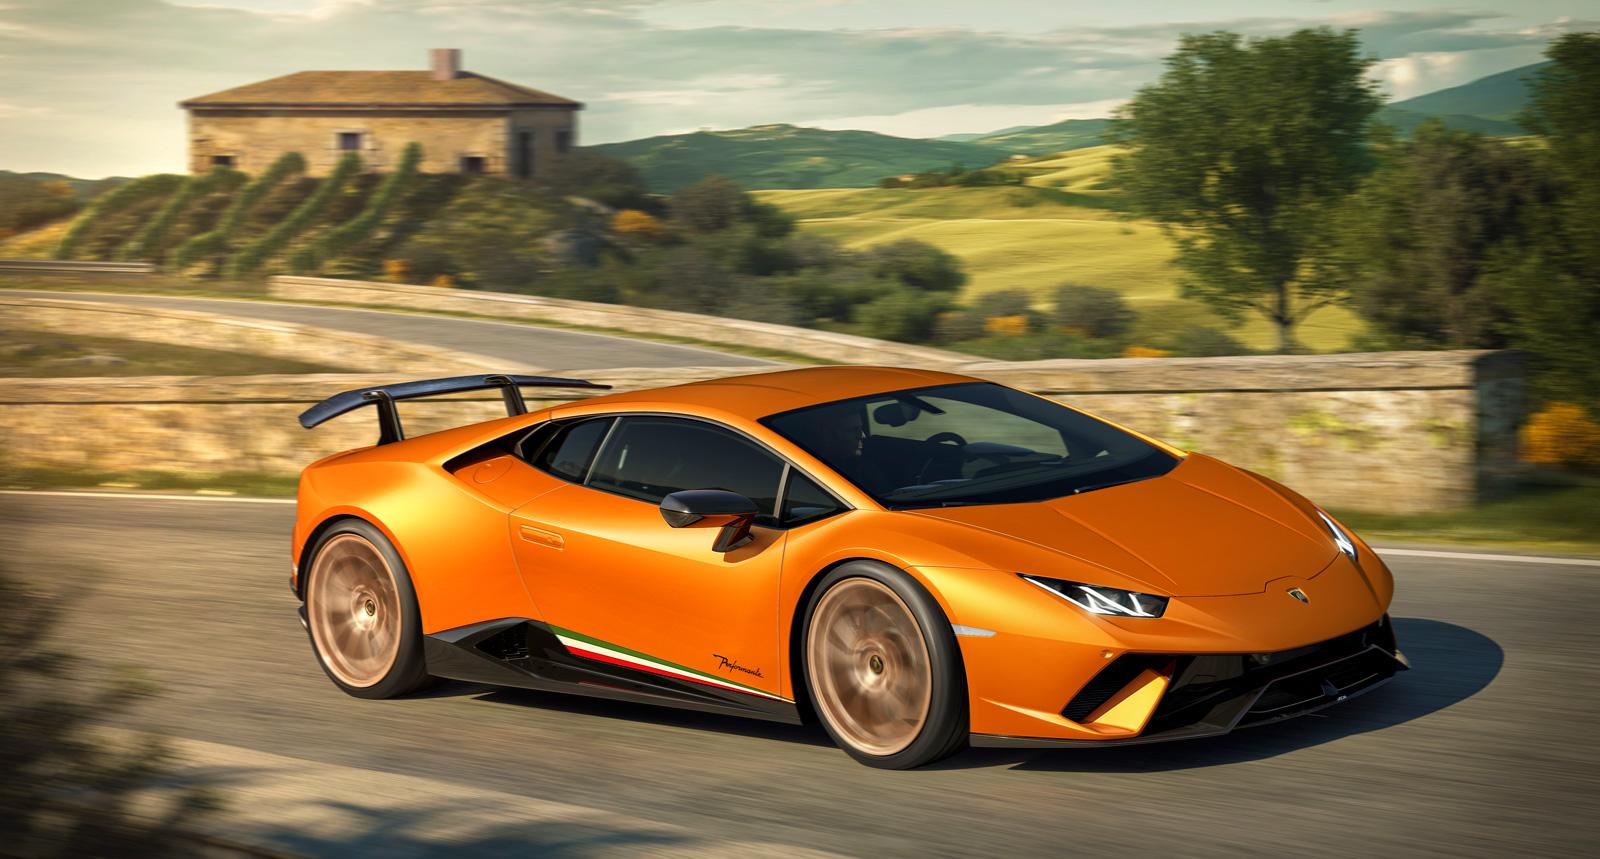 Lamborghini's Official Position is Vaffanculo